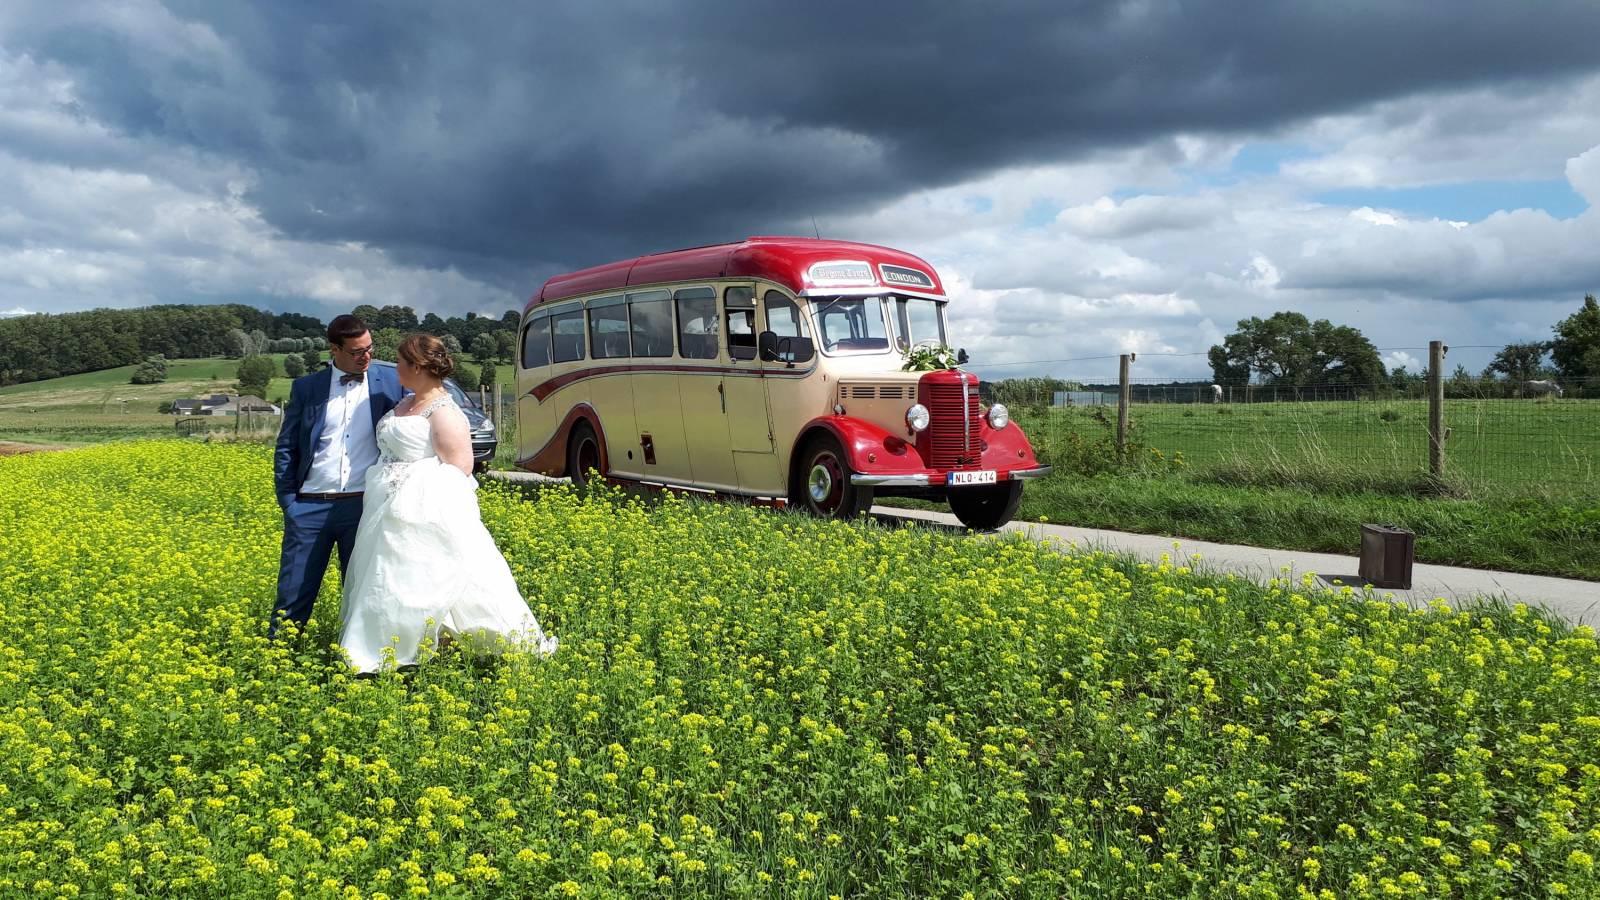 The London Ceremony Bus - Trouwvervoer - Ceremonievervoer - Bus - House of Weddings - 3